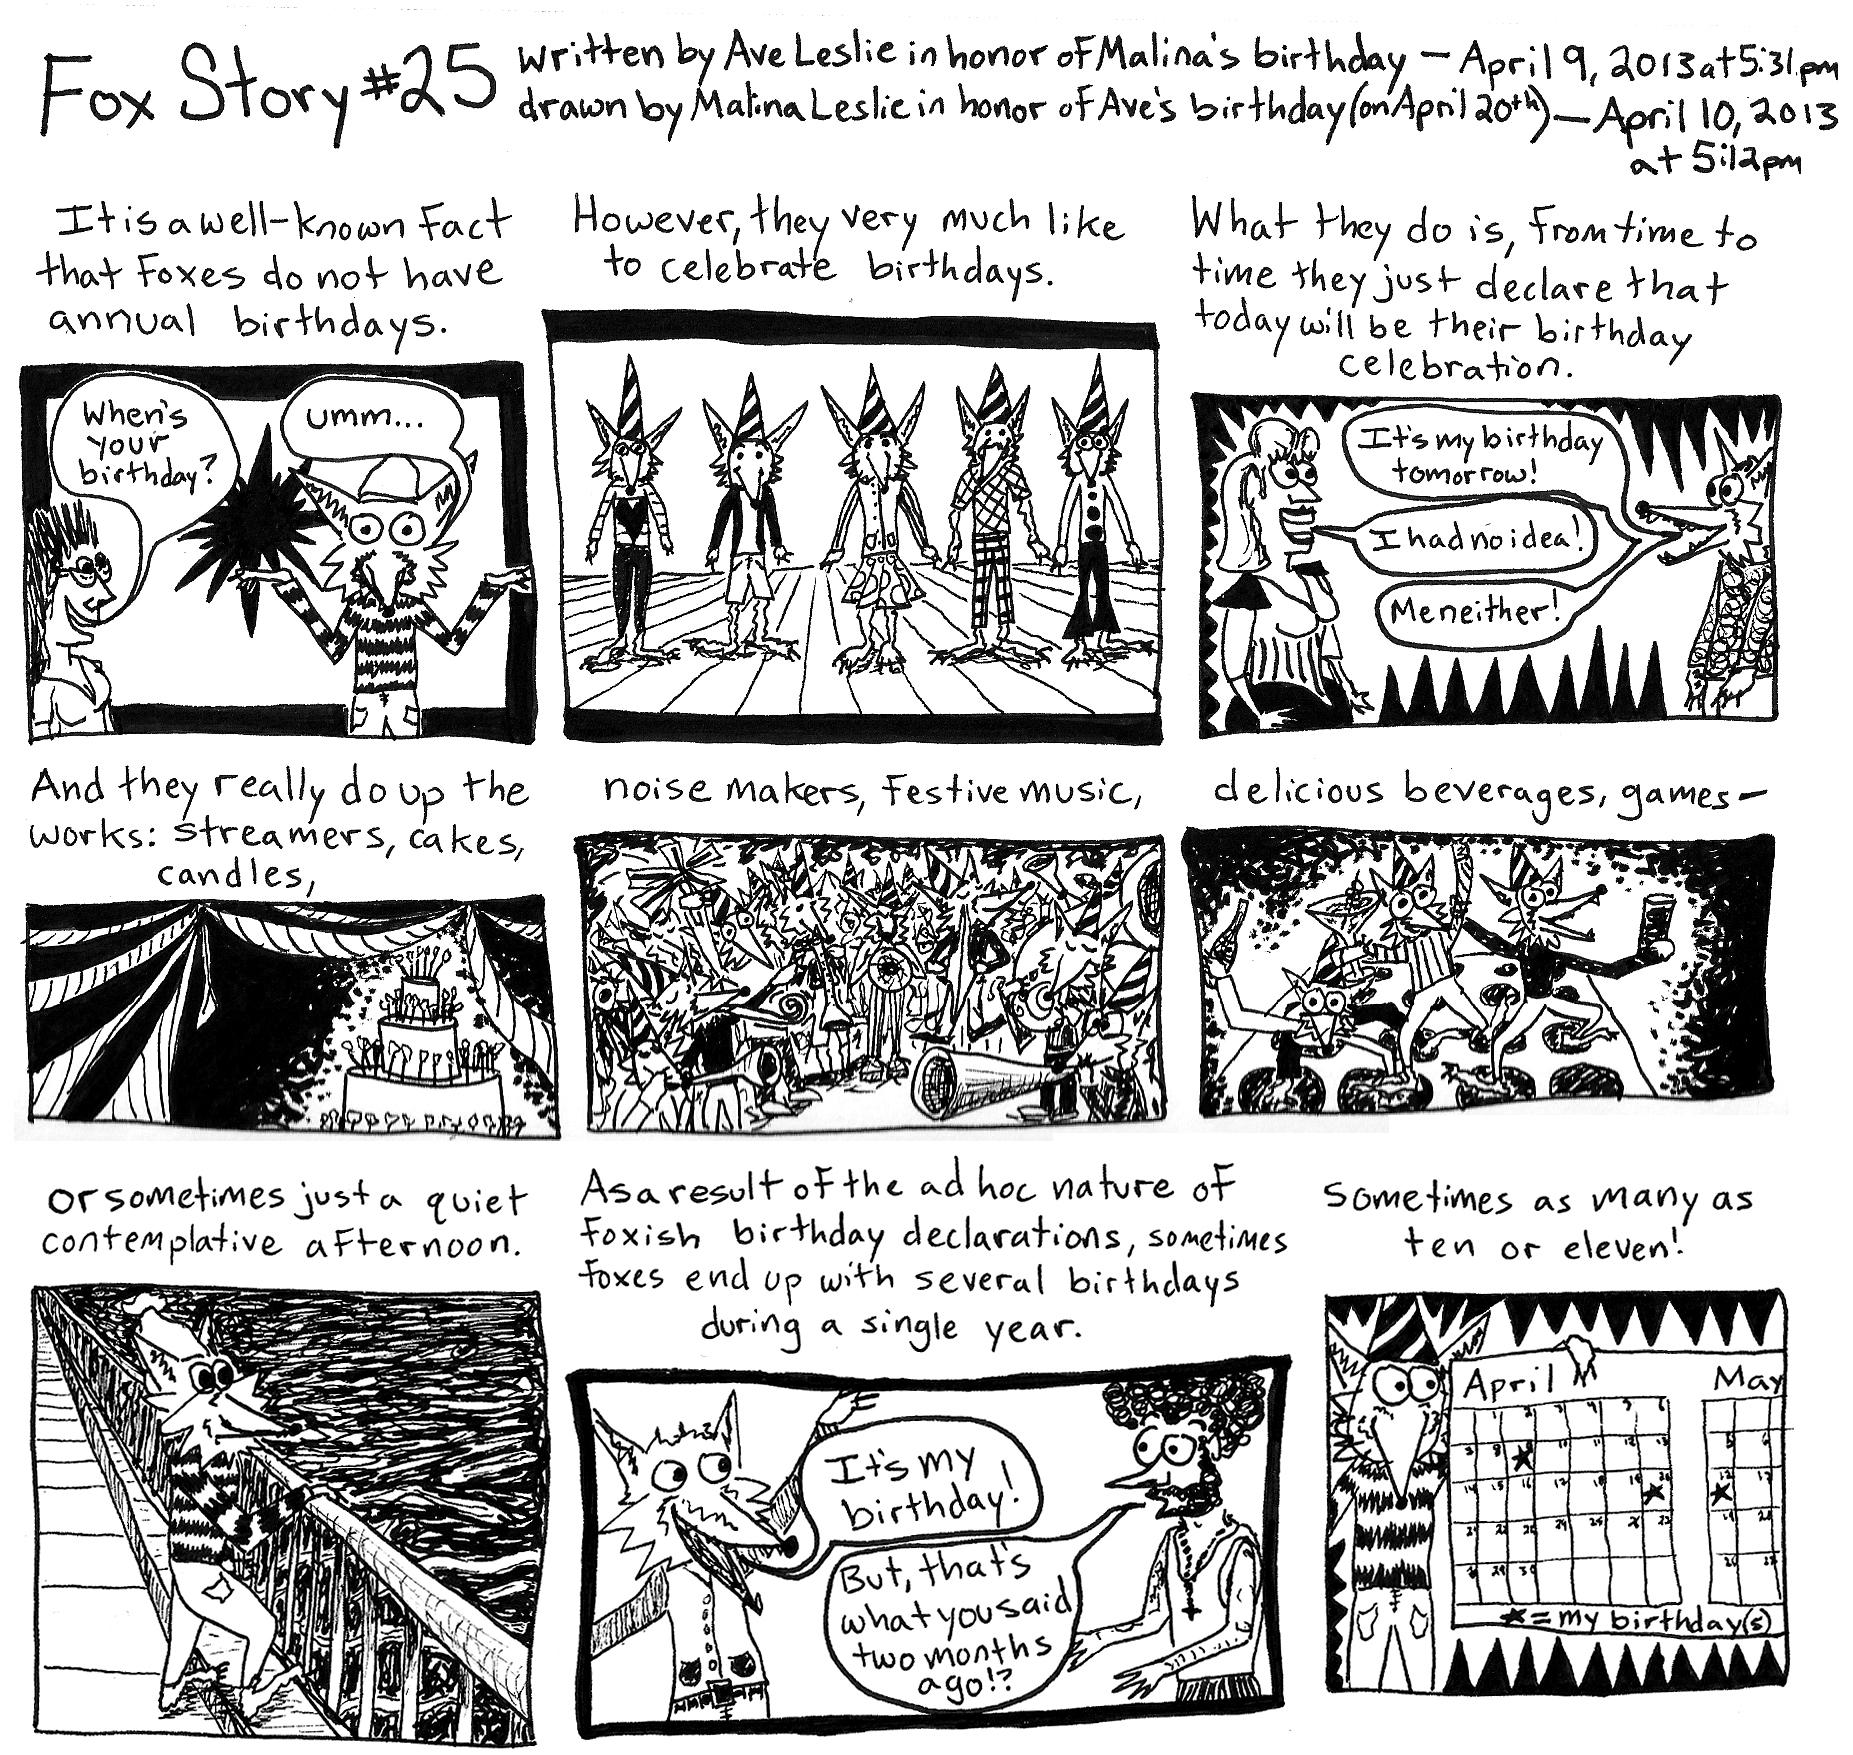 Fox Story 25 Part 1